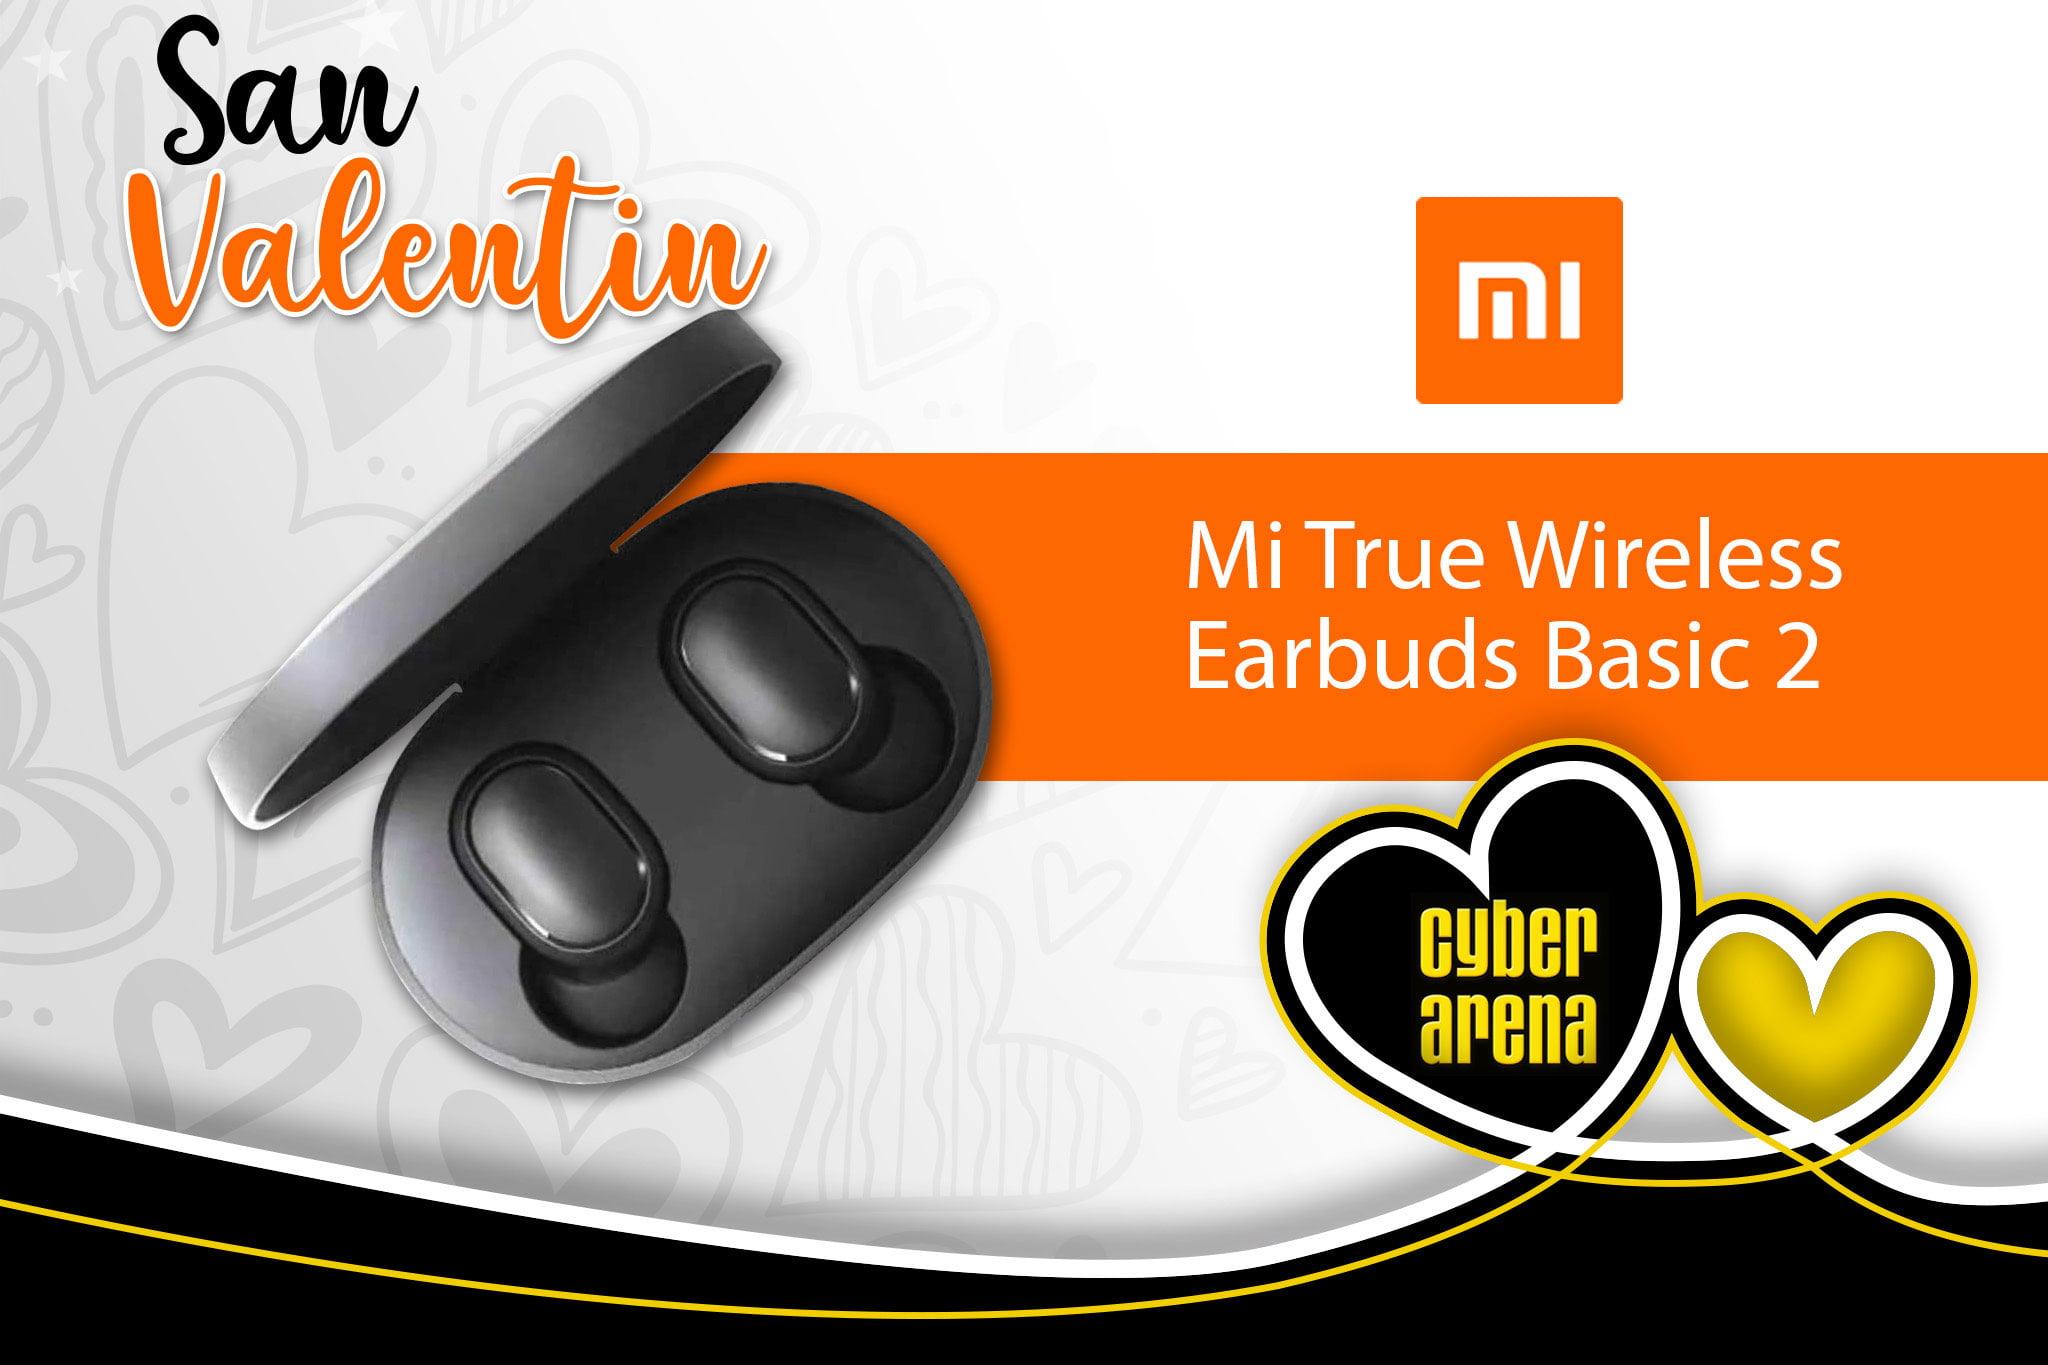 My True Wireless Earbuds Basic 2 Headphones - Cyber Arena